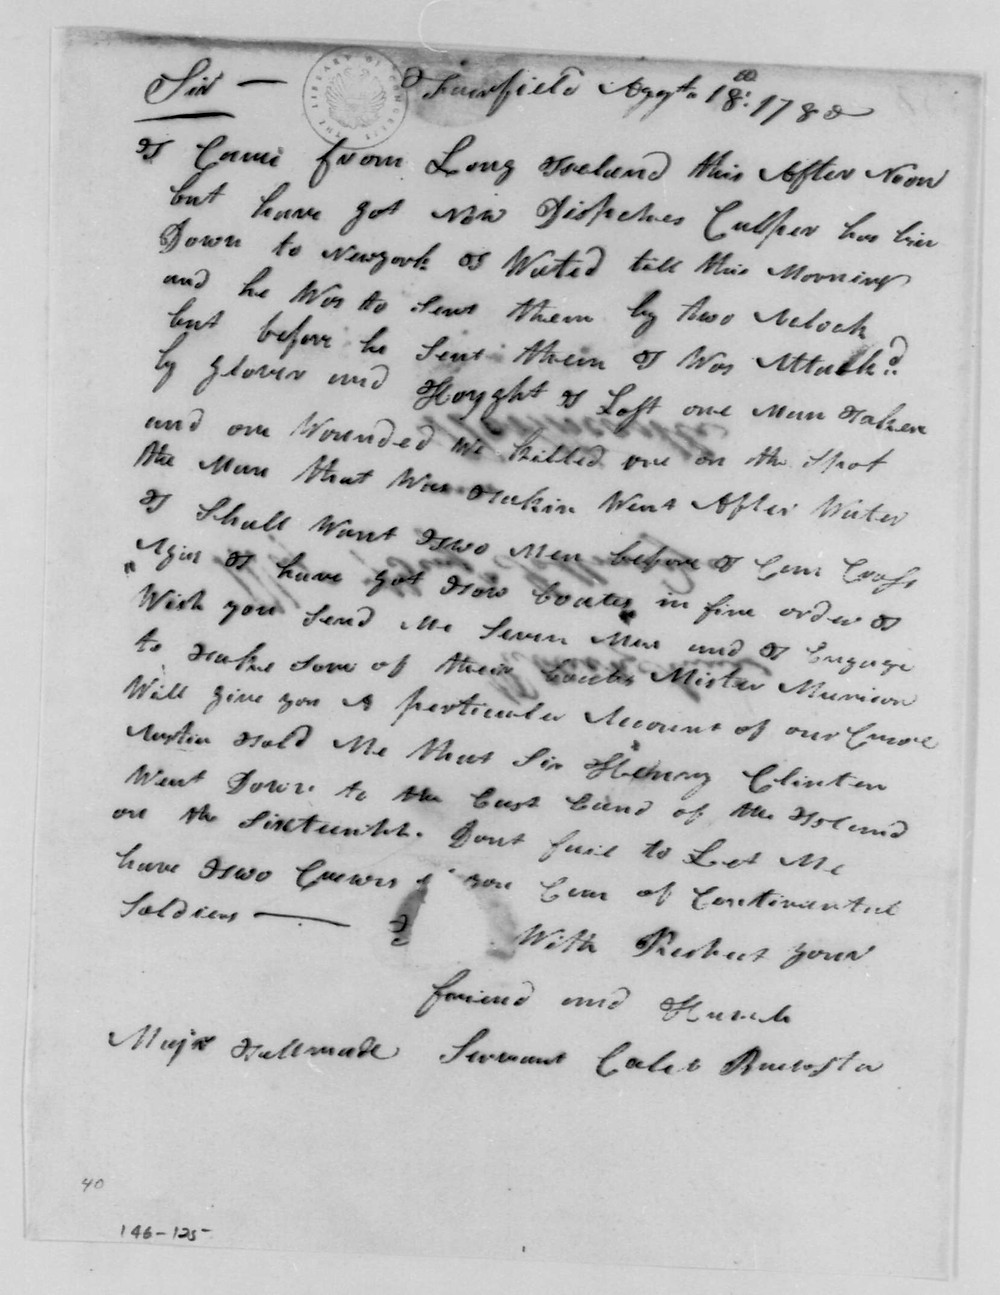 Culper Spy Letter